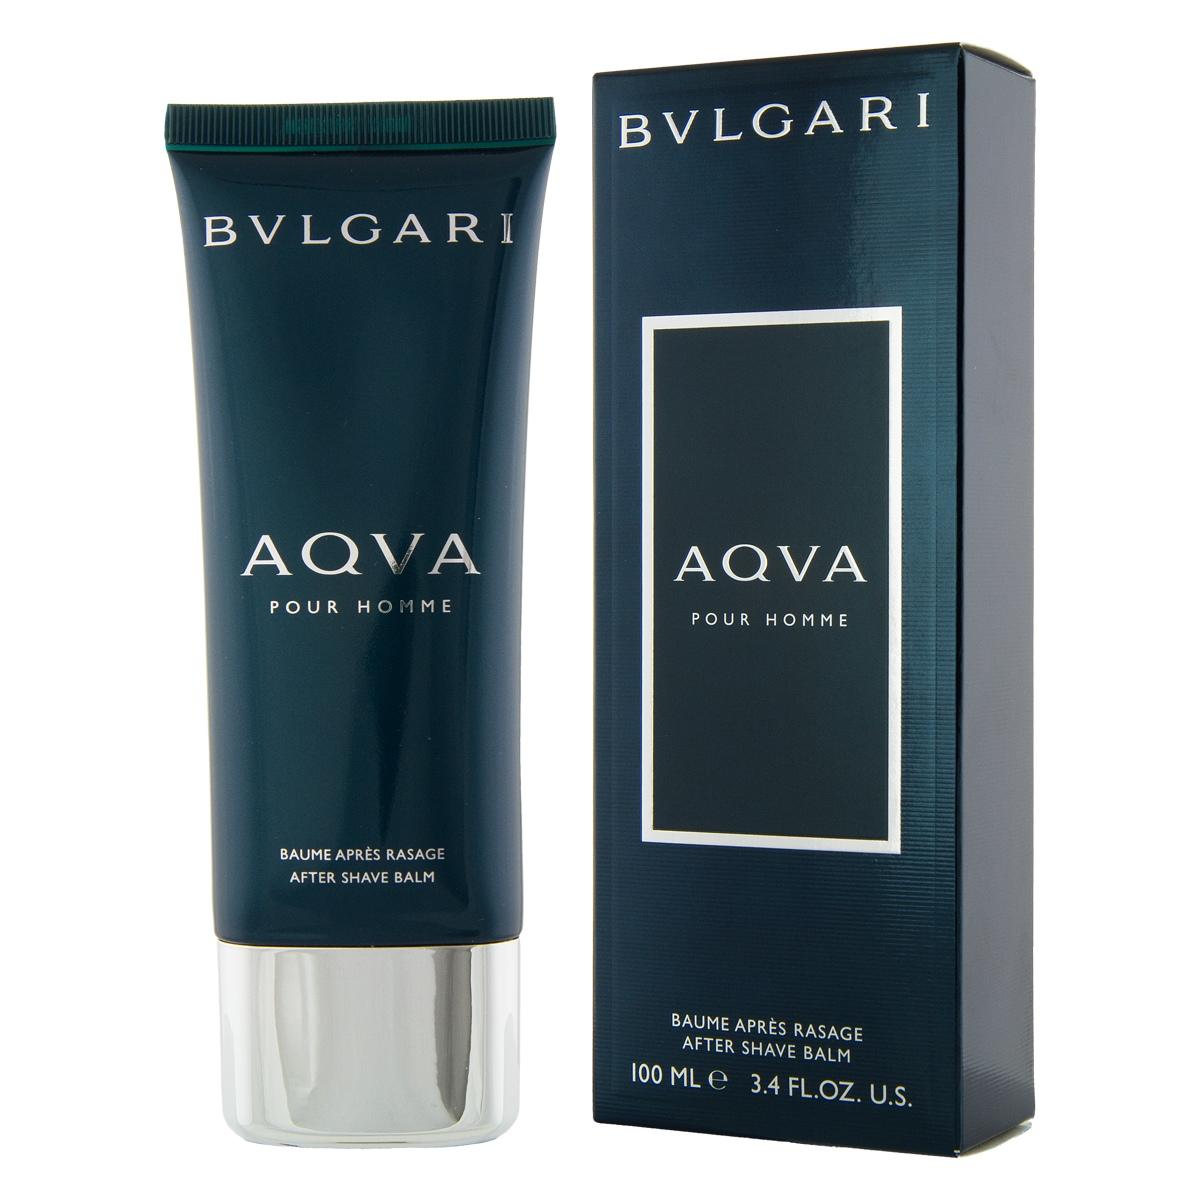 Bvlgari Aqva Pour Homme ASB 100 ml M